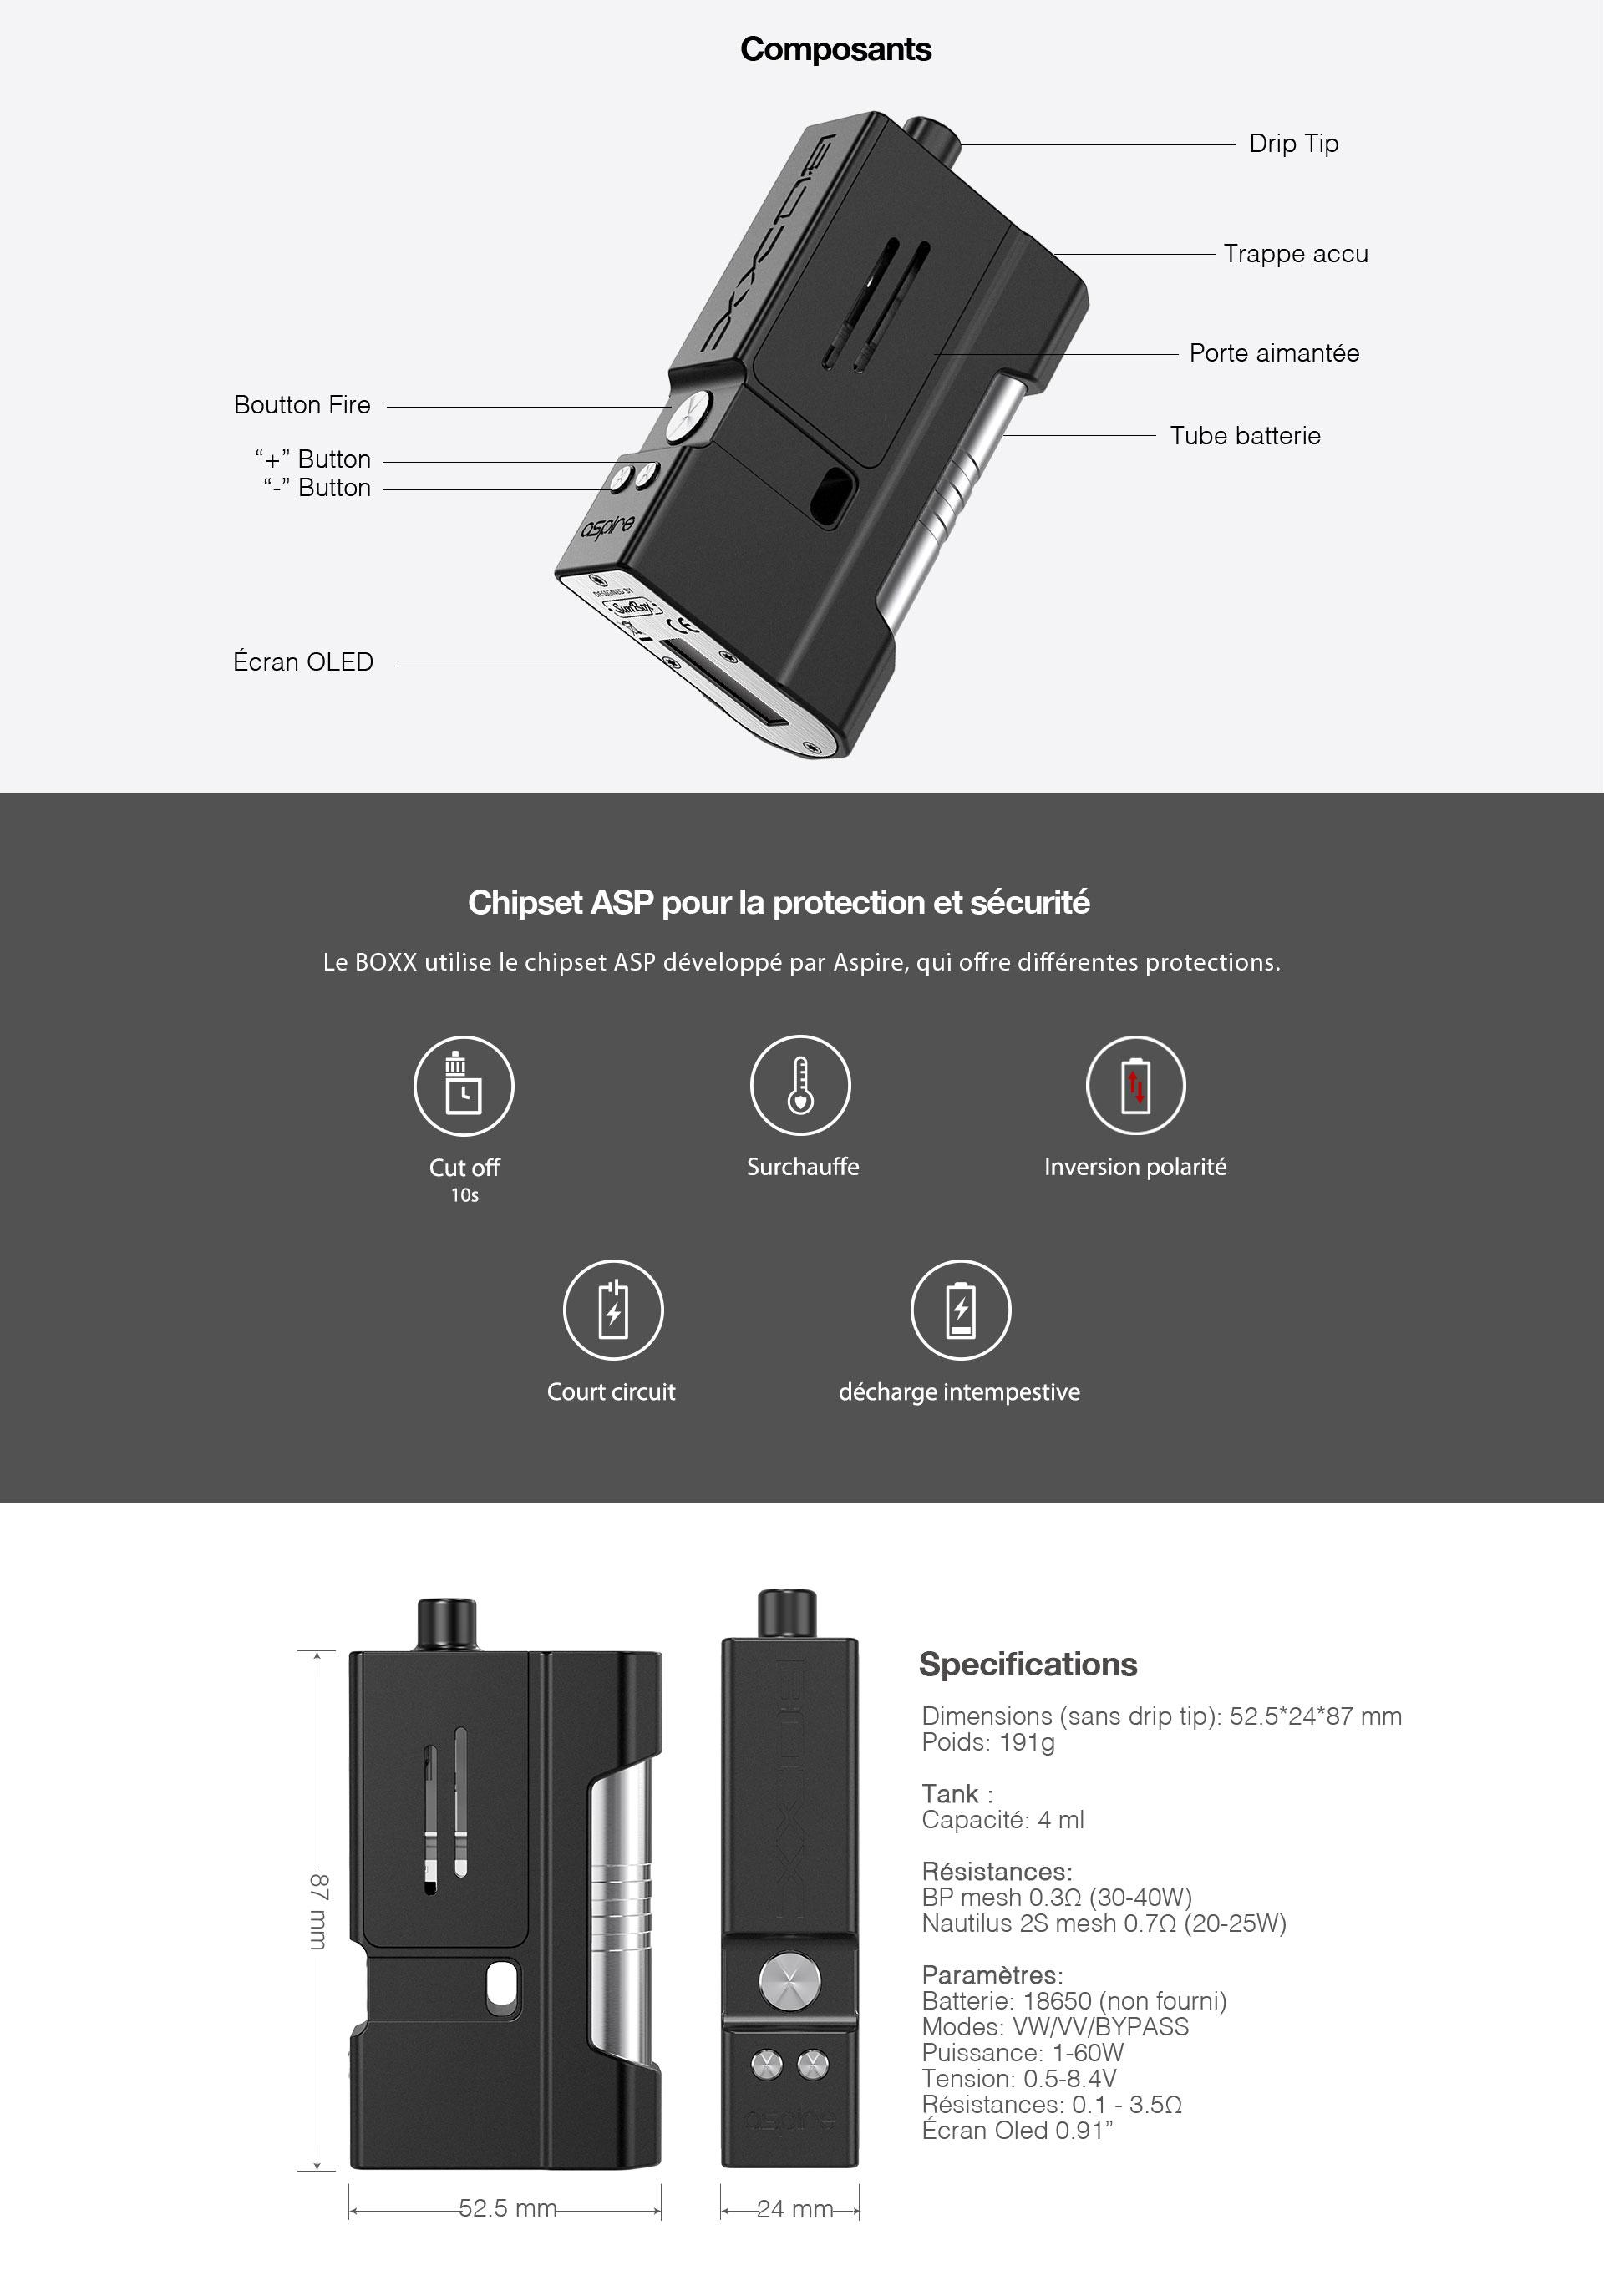 Kit Boxx Aspire Prestige SunBox Atmizoo – Anteprima